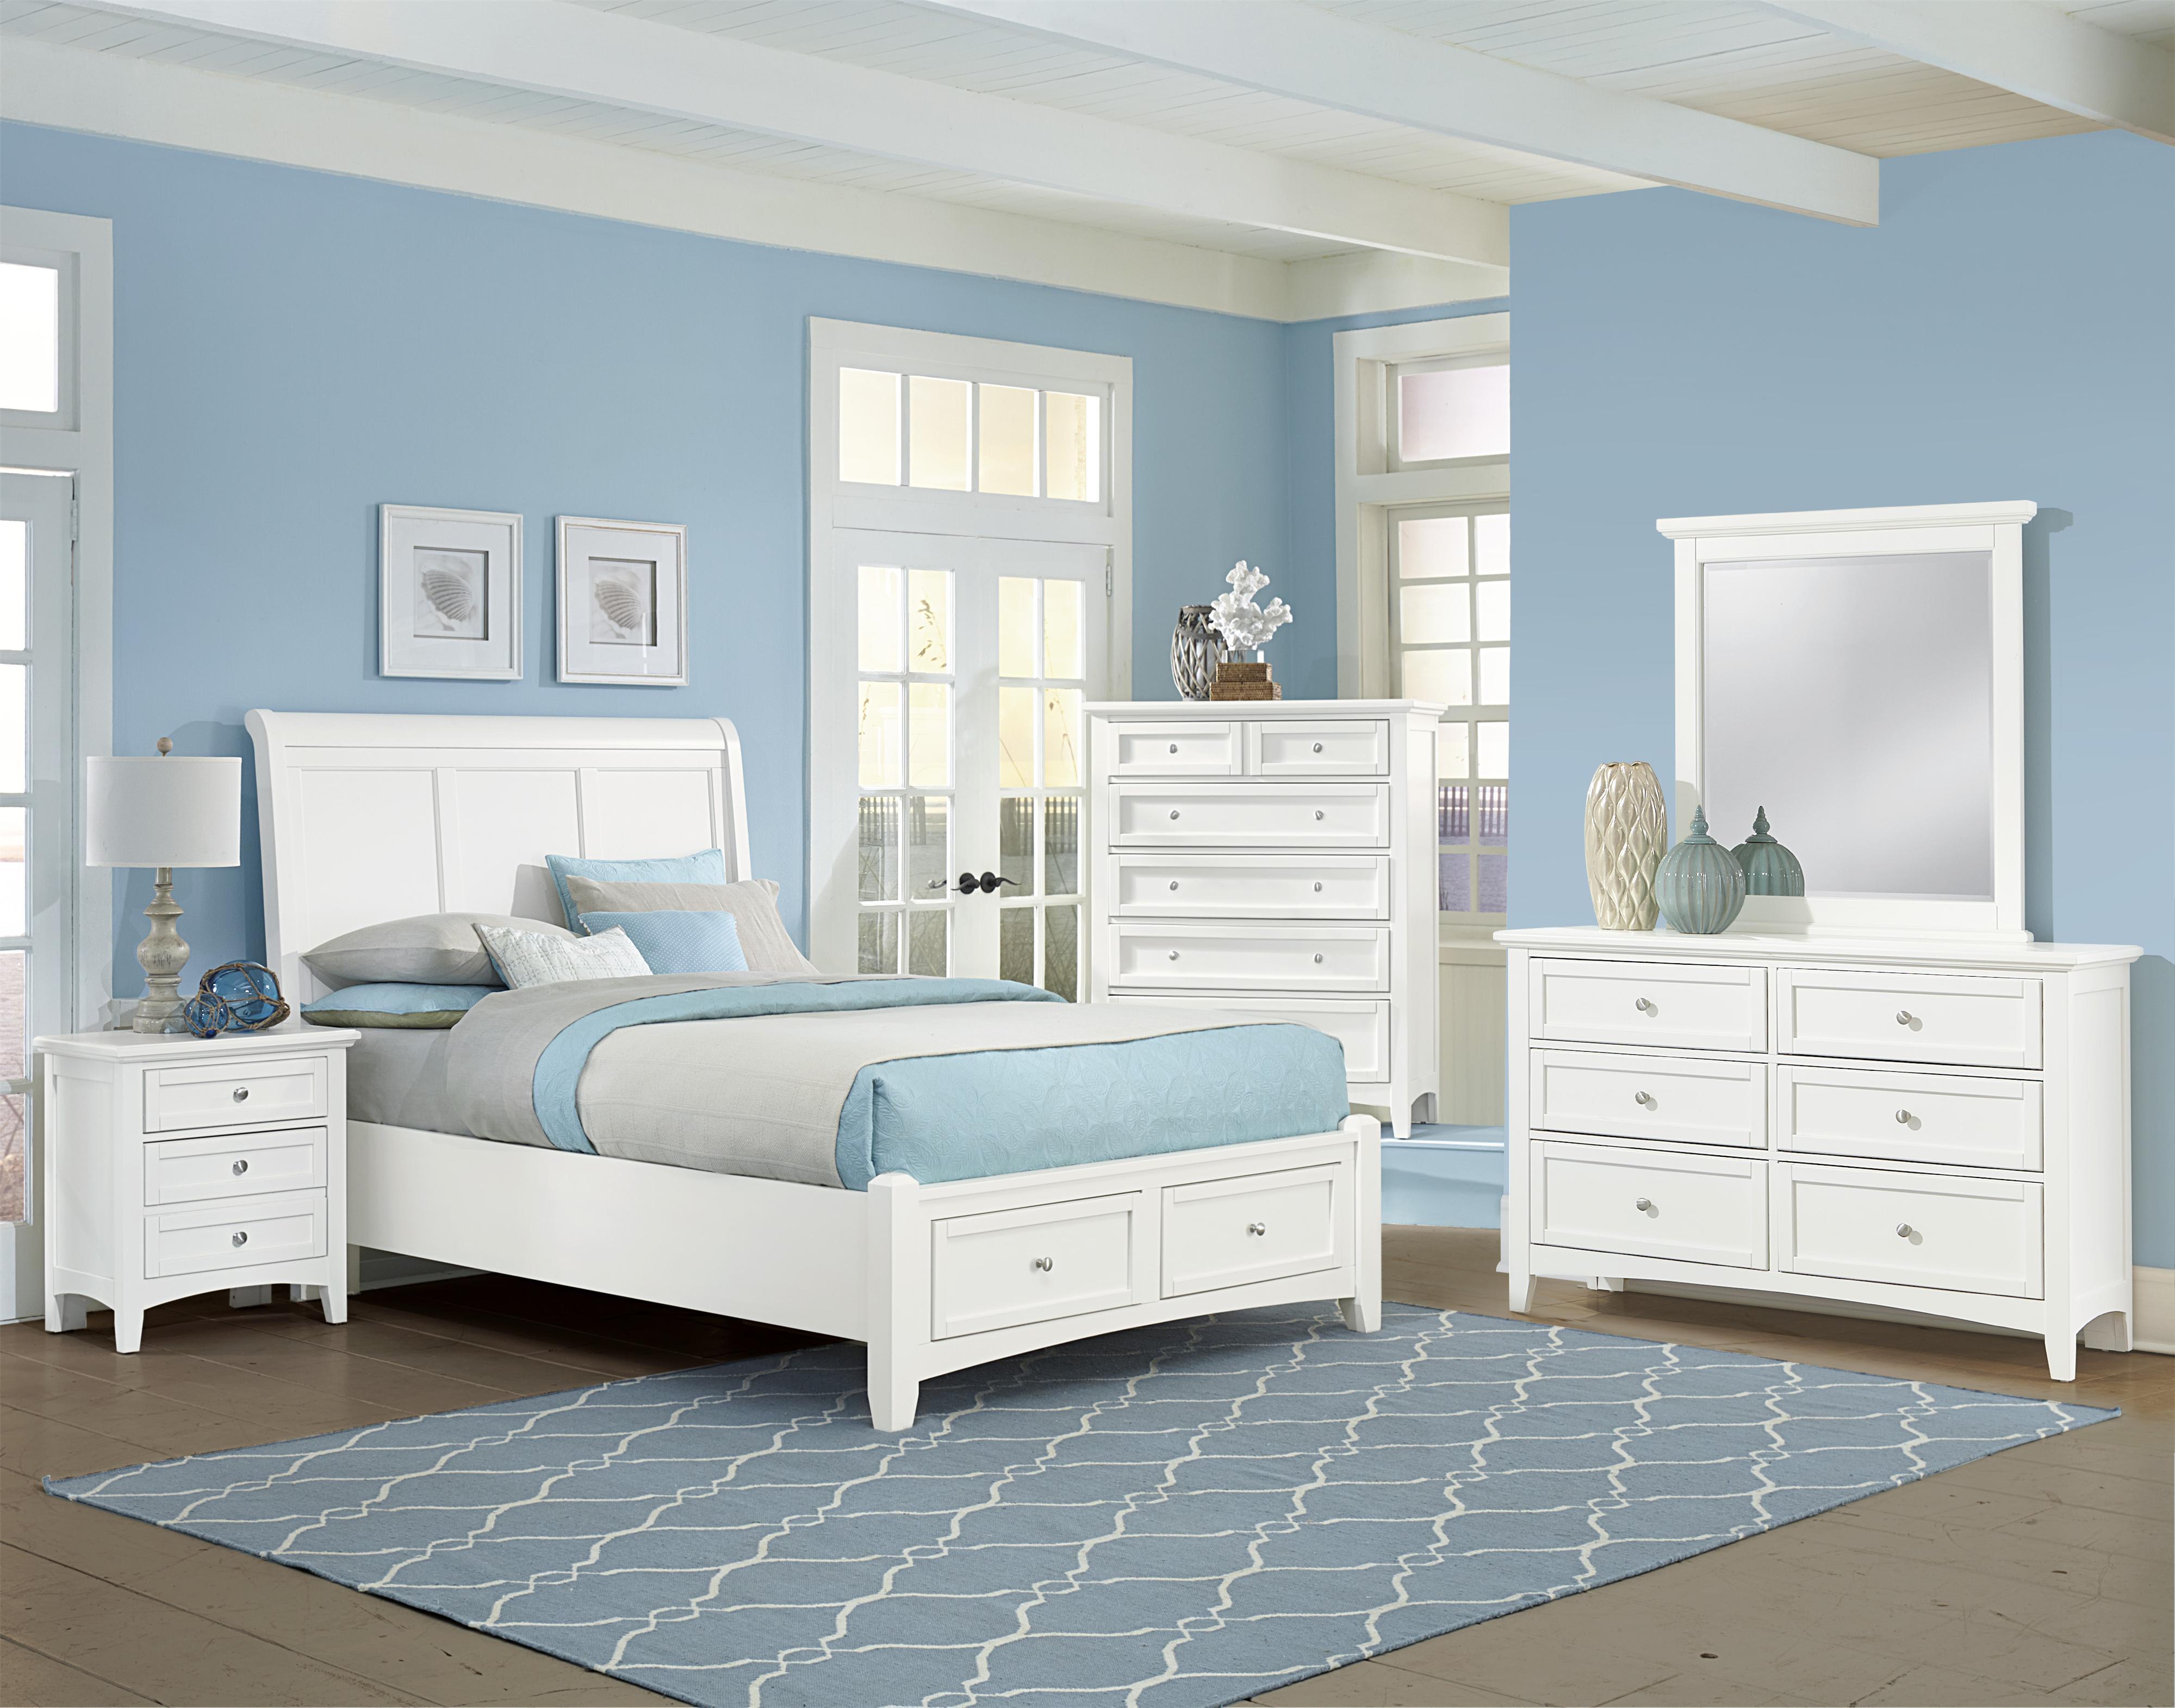 vaughan bassett bonanza full bedroom group belfort furniture bedroom groups. Black Bedroom Furniture Sets. Home Design Ideas